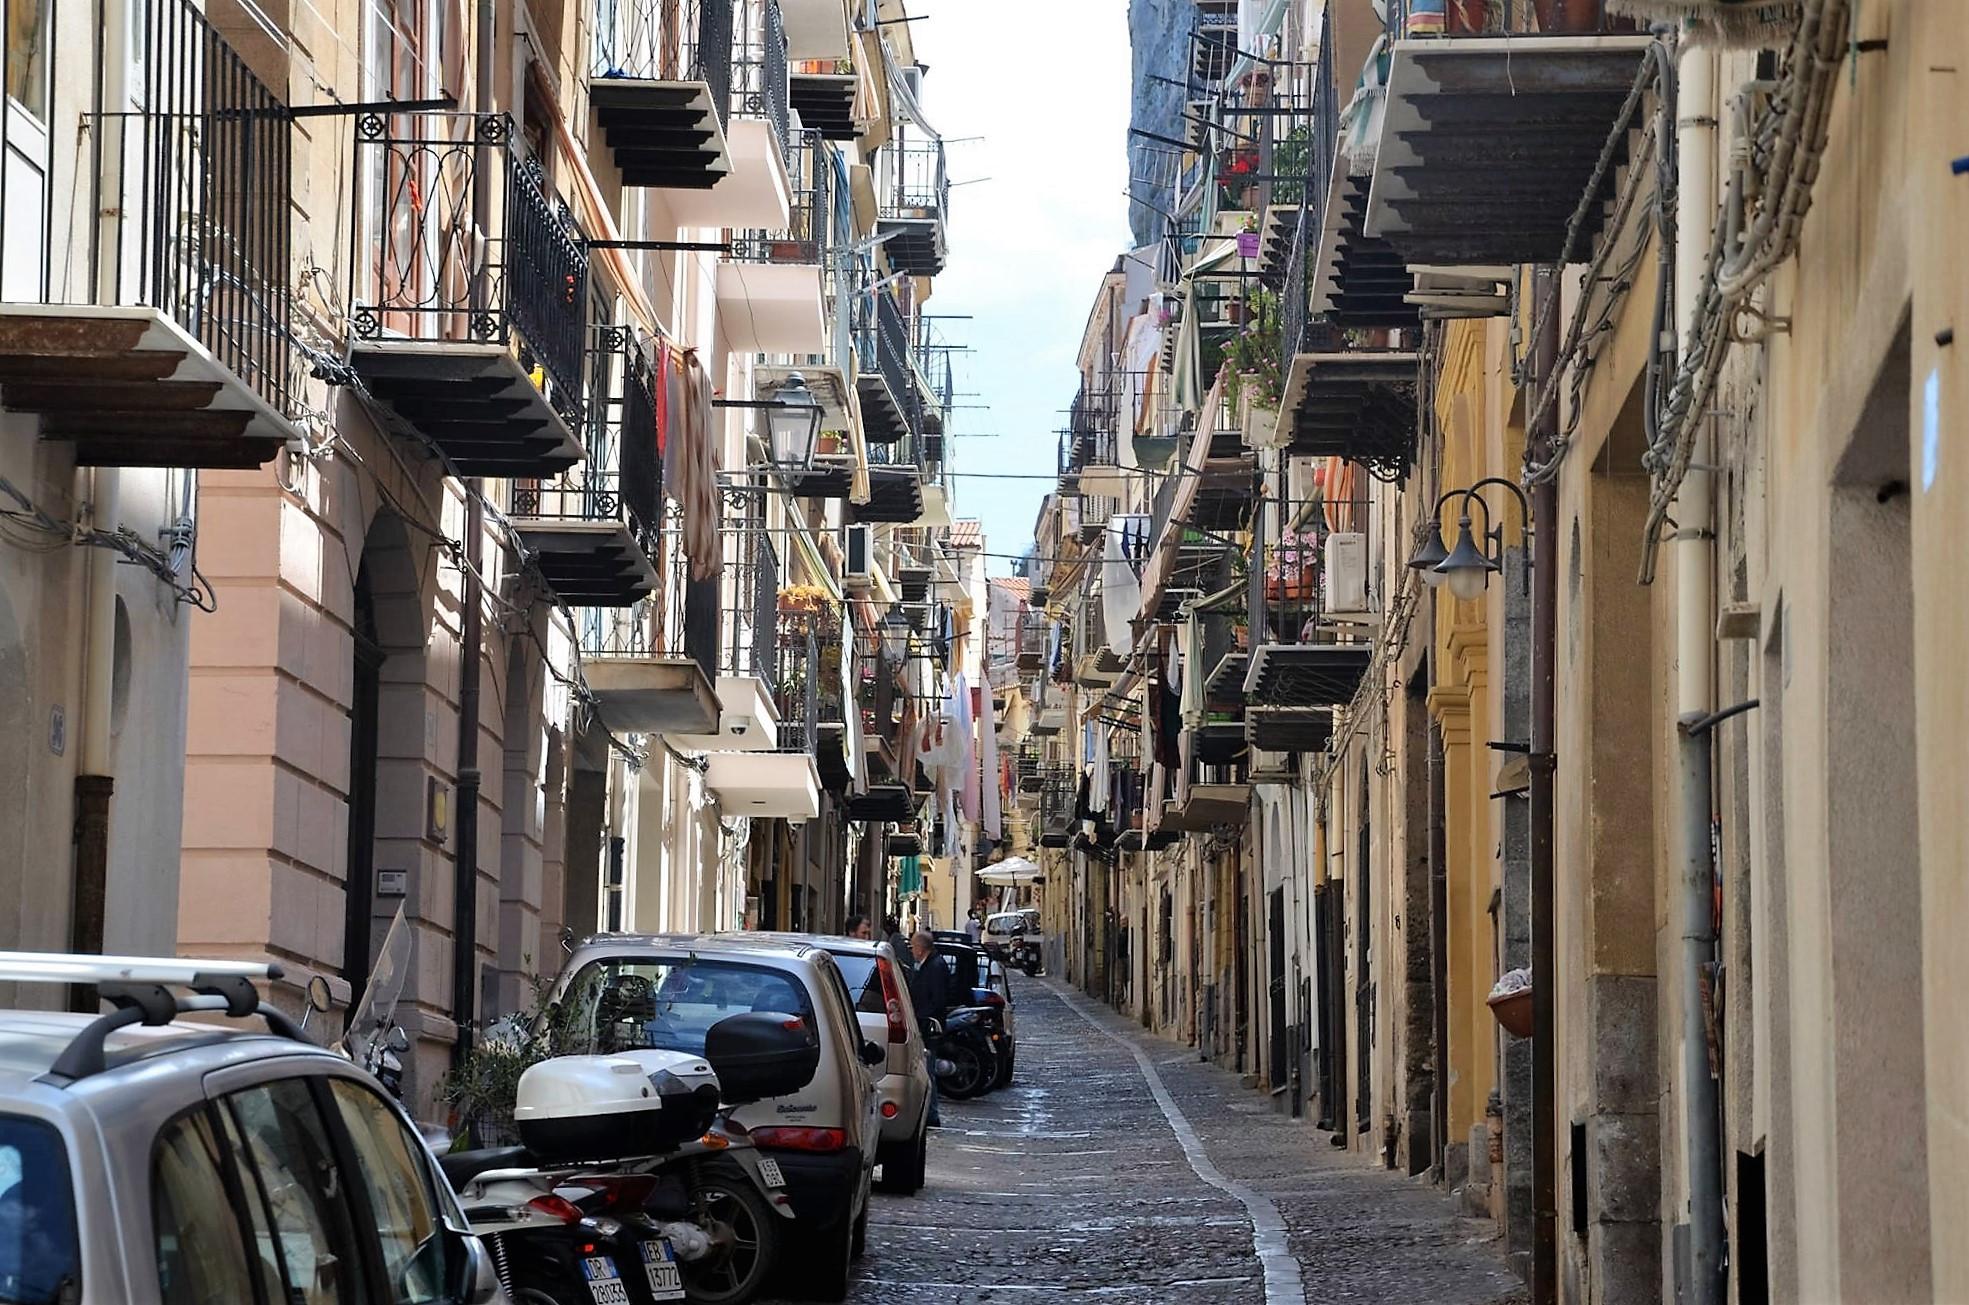 Типичная улица, жилых кварталов. Чефалу. Сицилия. регата OML 216. Фото А. Подколзин